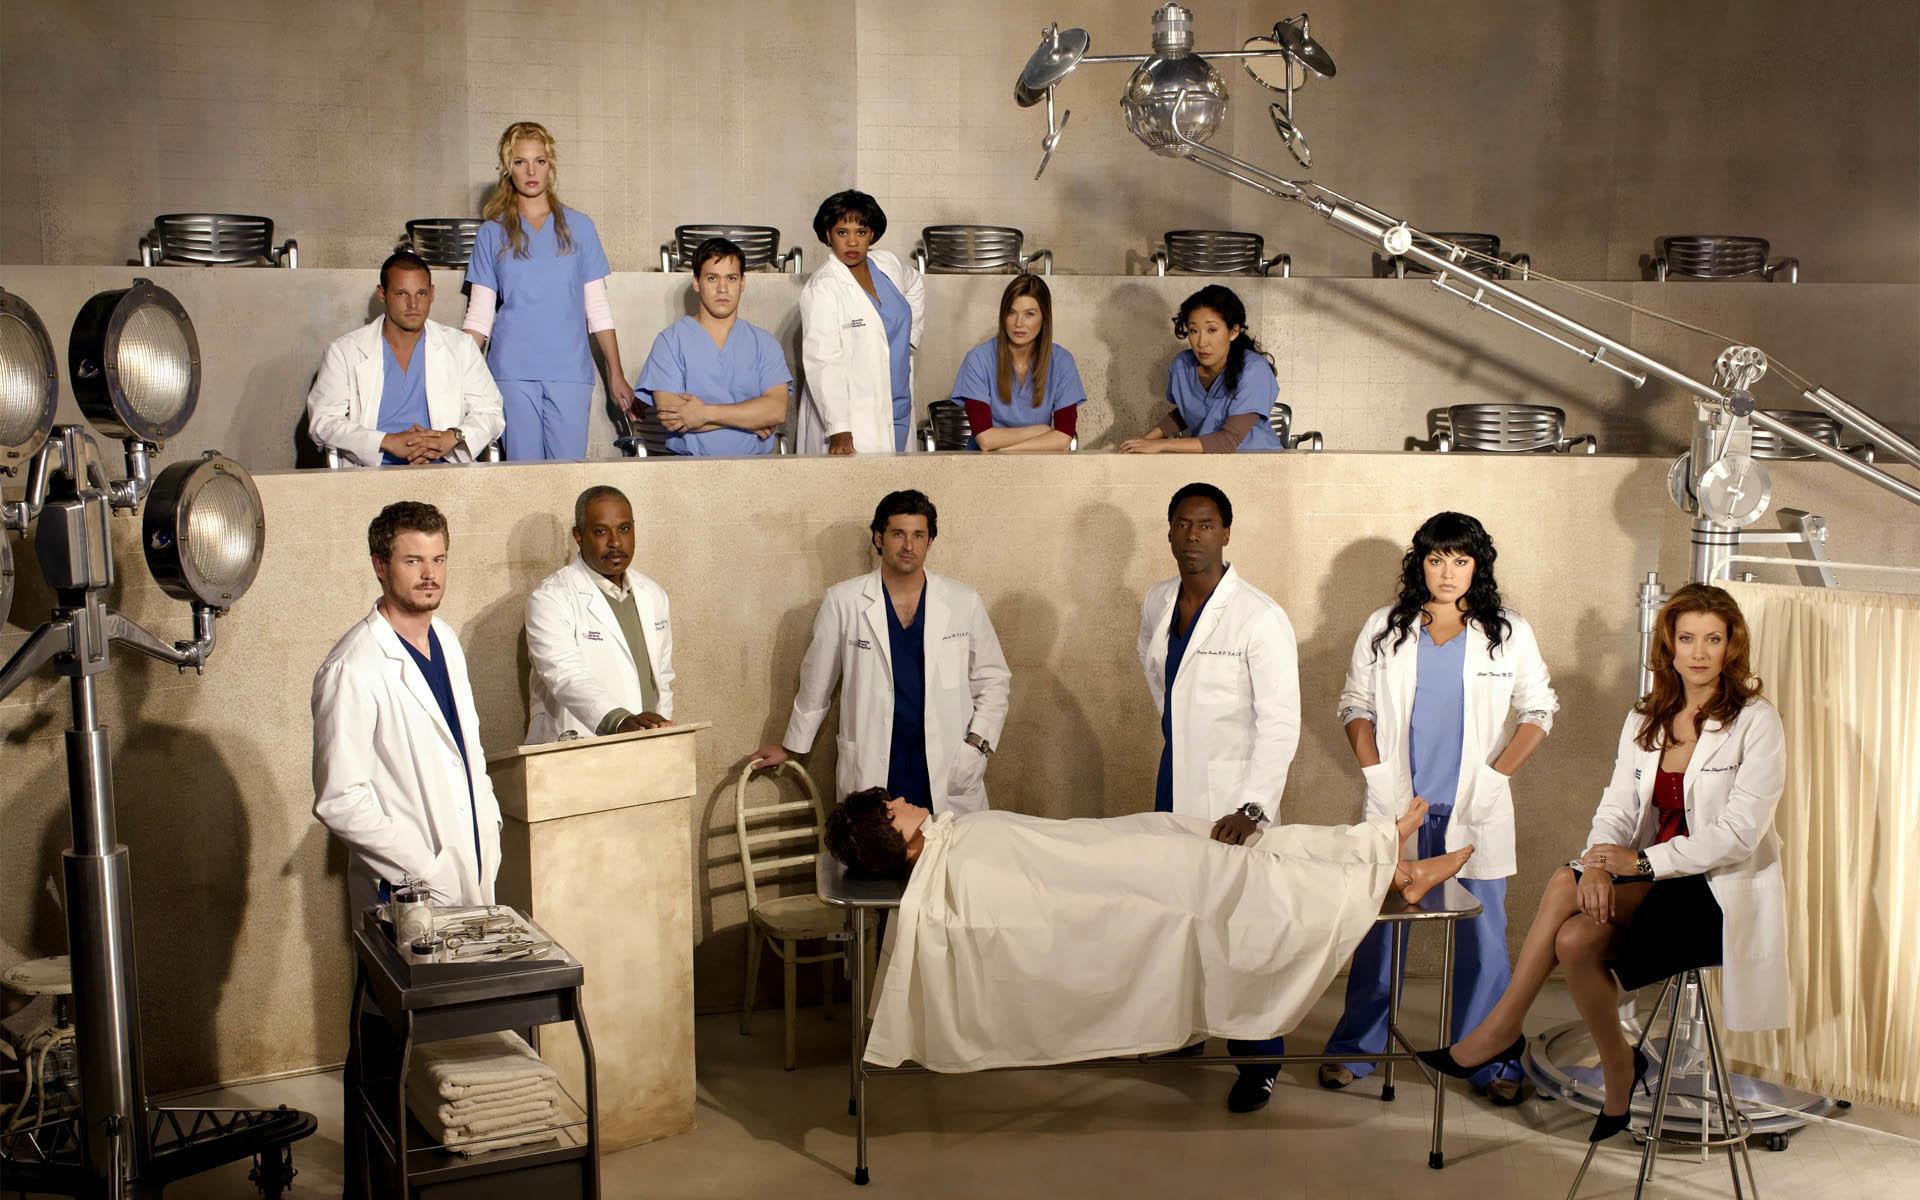 Grey's Anatomy Promo wallpaper